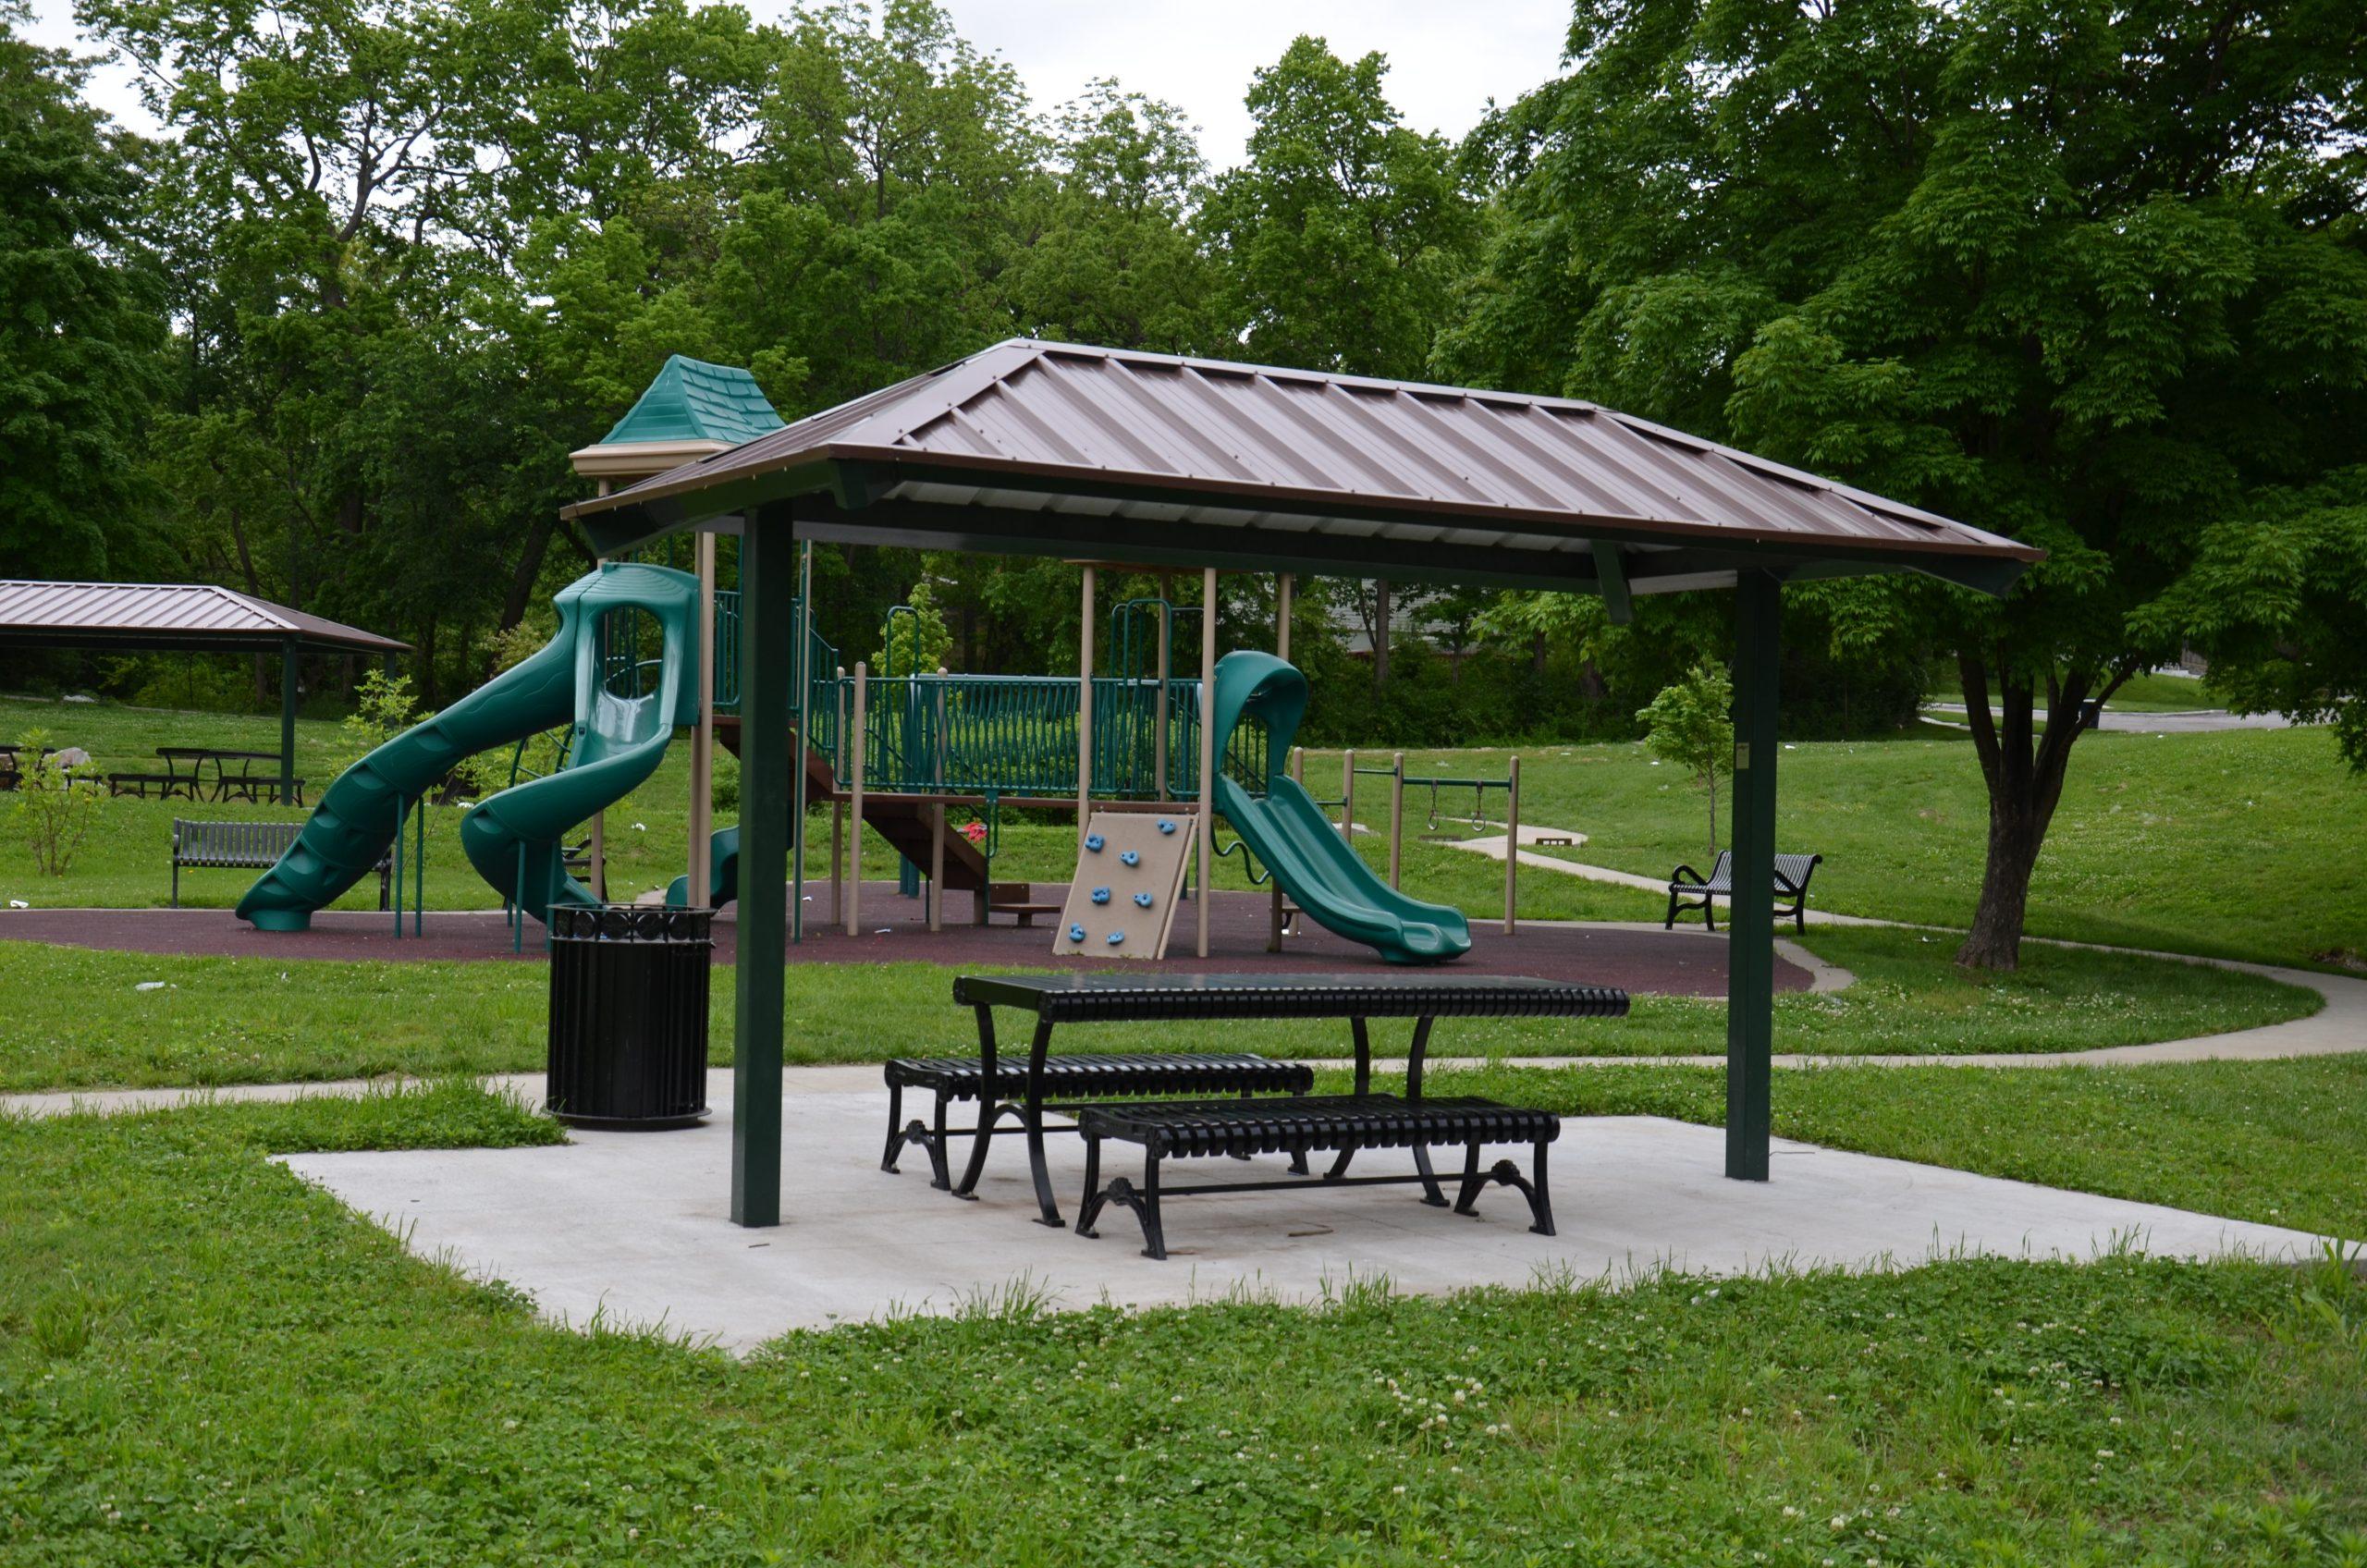 Arleta Park Shelter #1 (RESERVABLE MAY 1-OCTOBER 31)